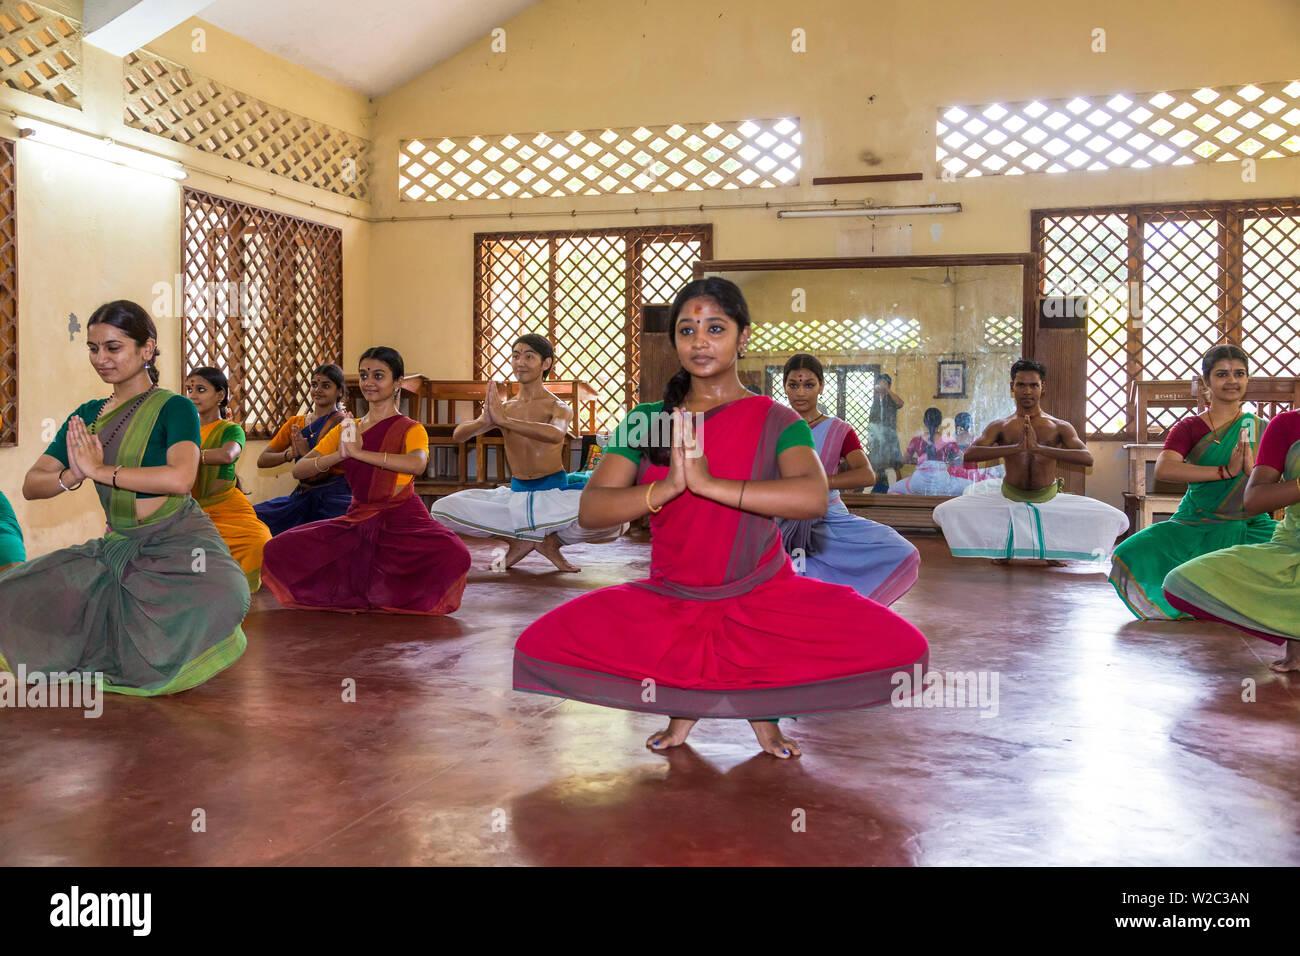 Tamil Nadu Dance Stock Photos & Tamil Nadu Dance Stock Images - Alamy